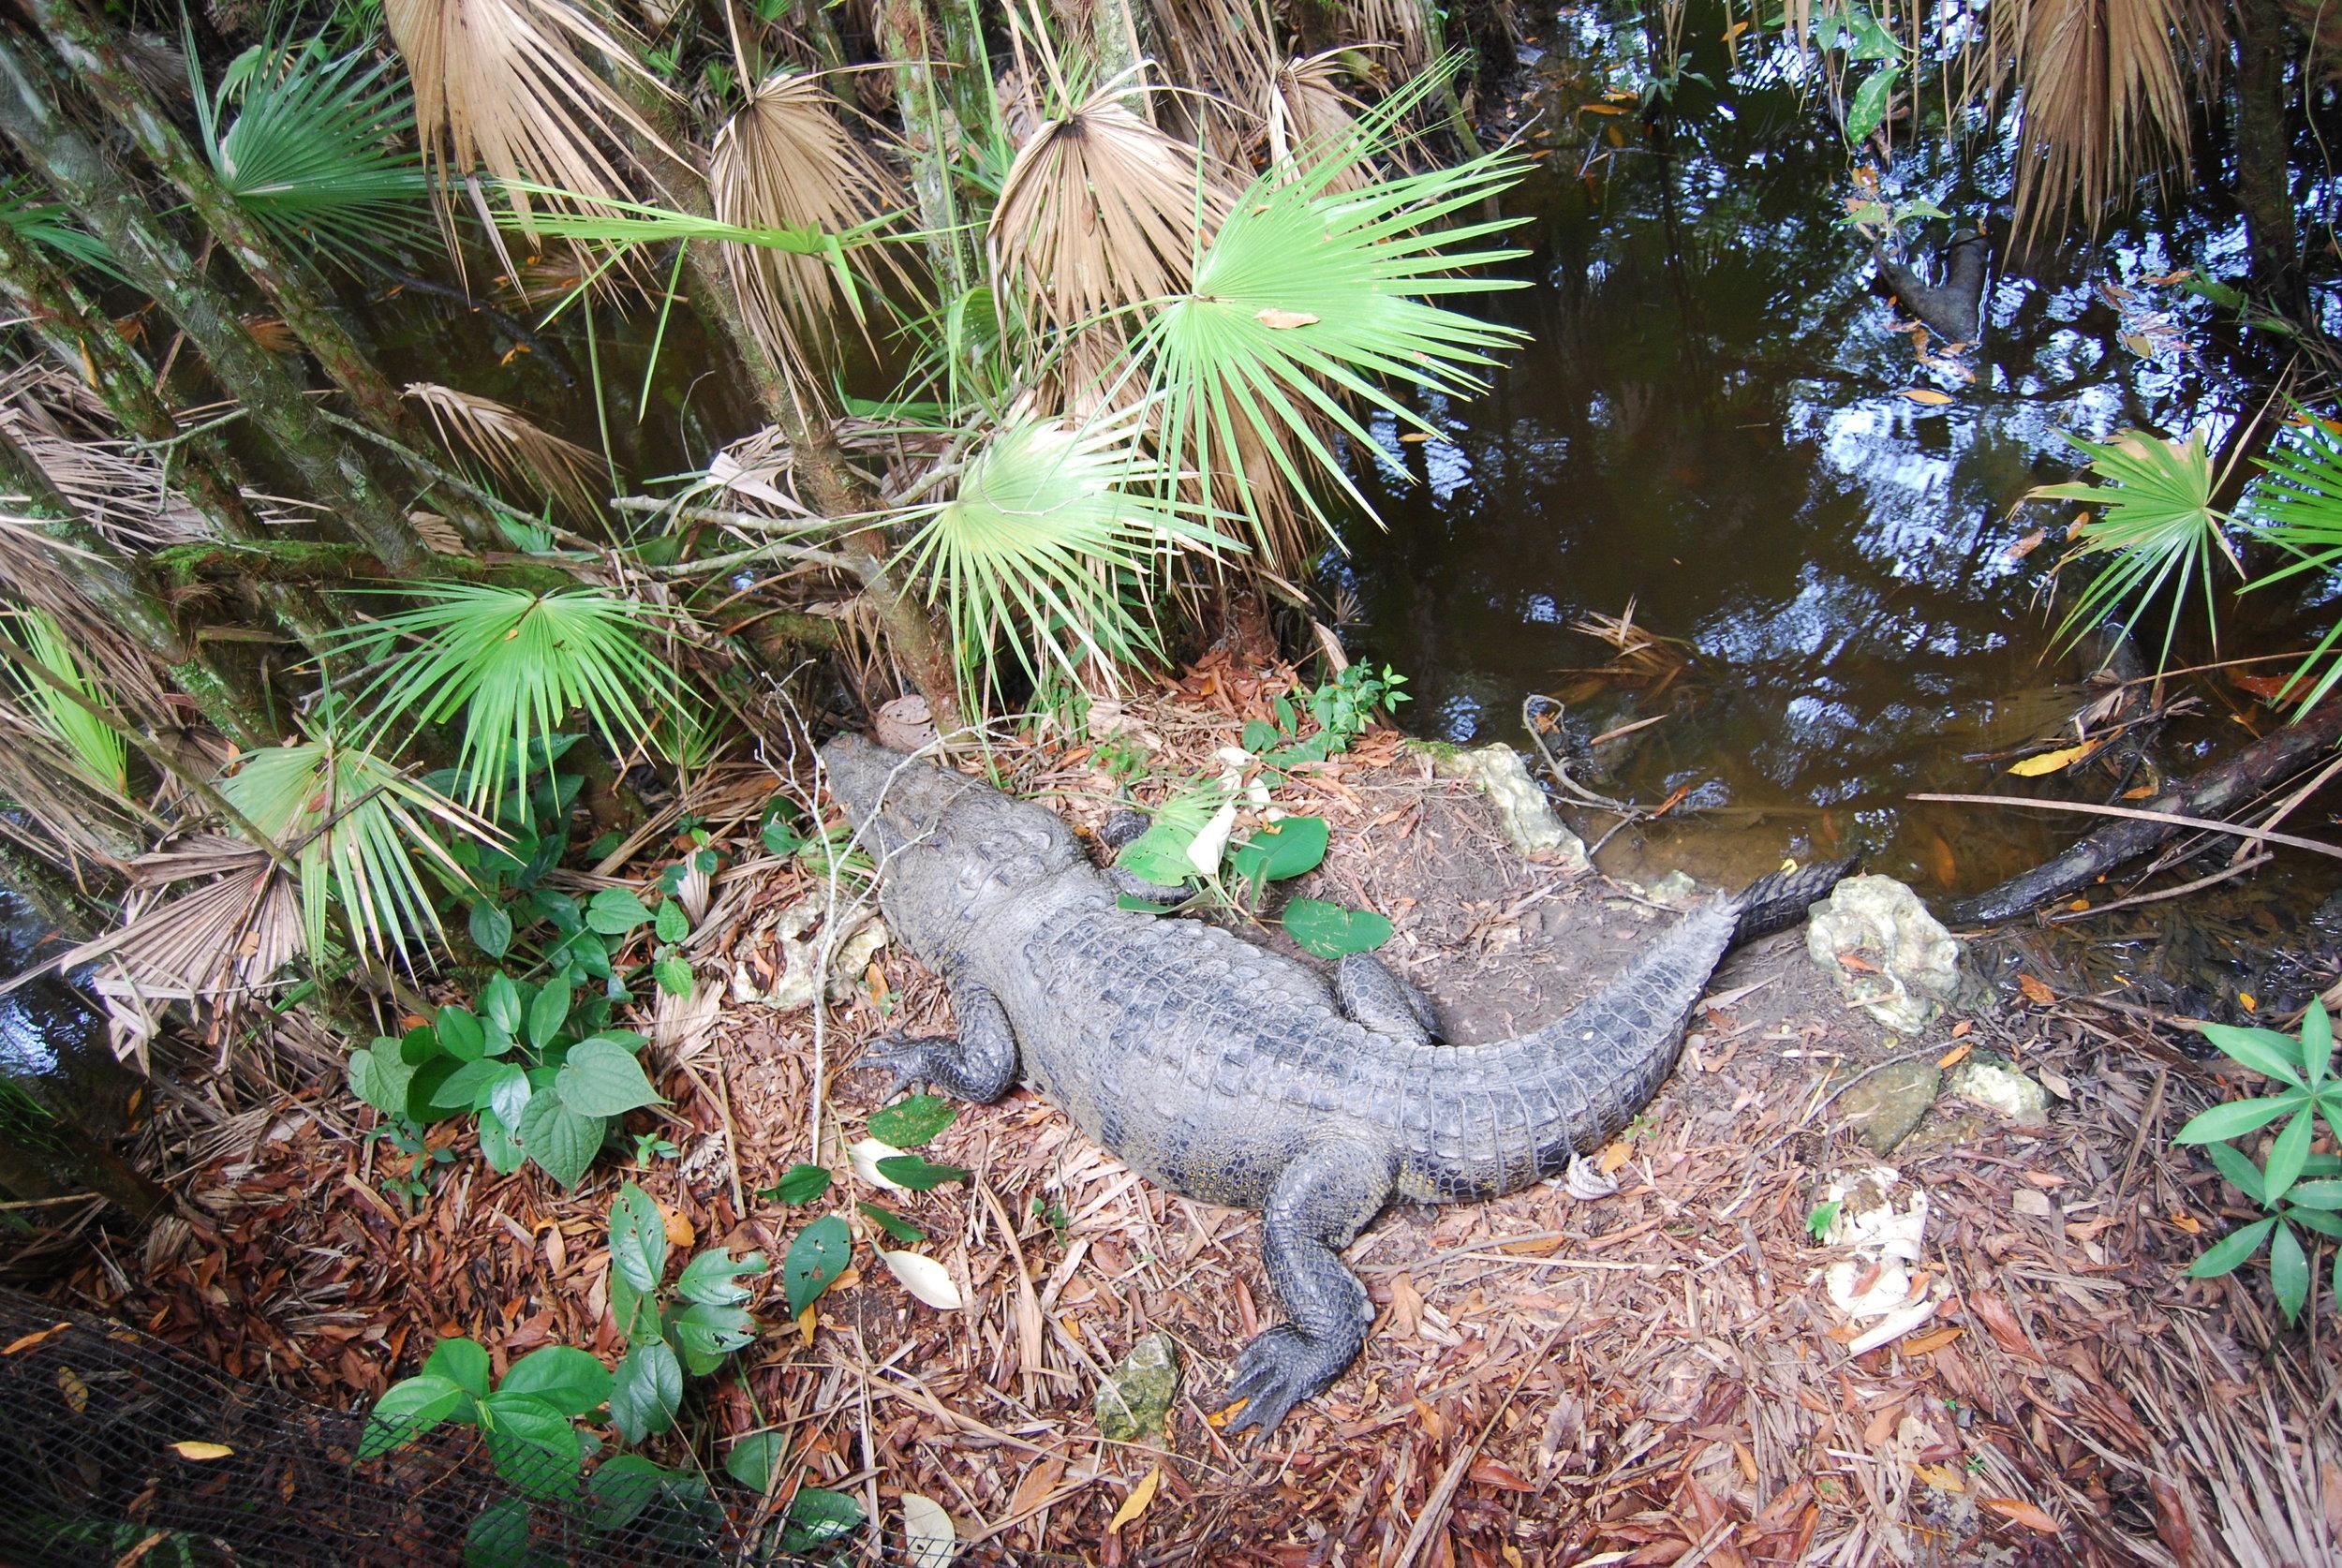 Morelet's Crocodile.